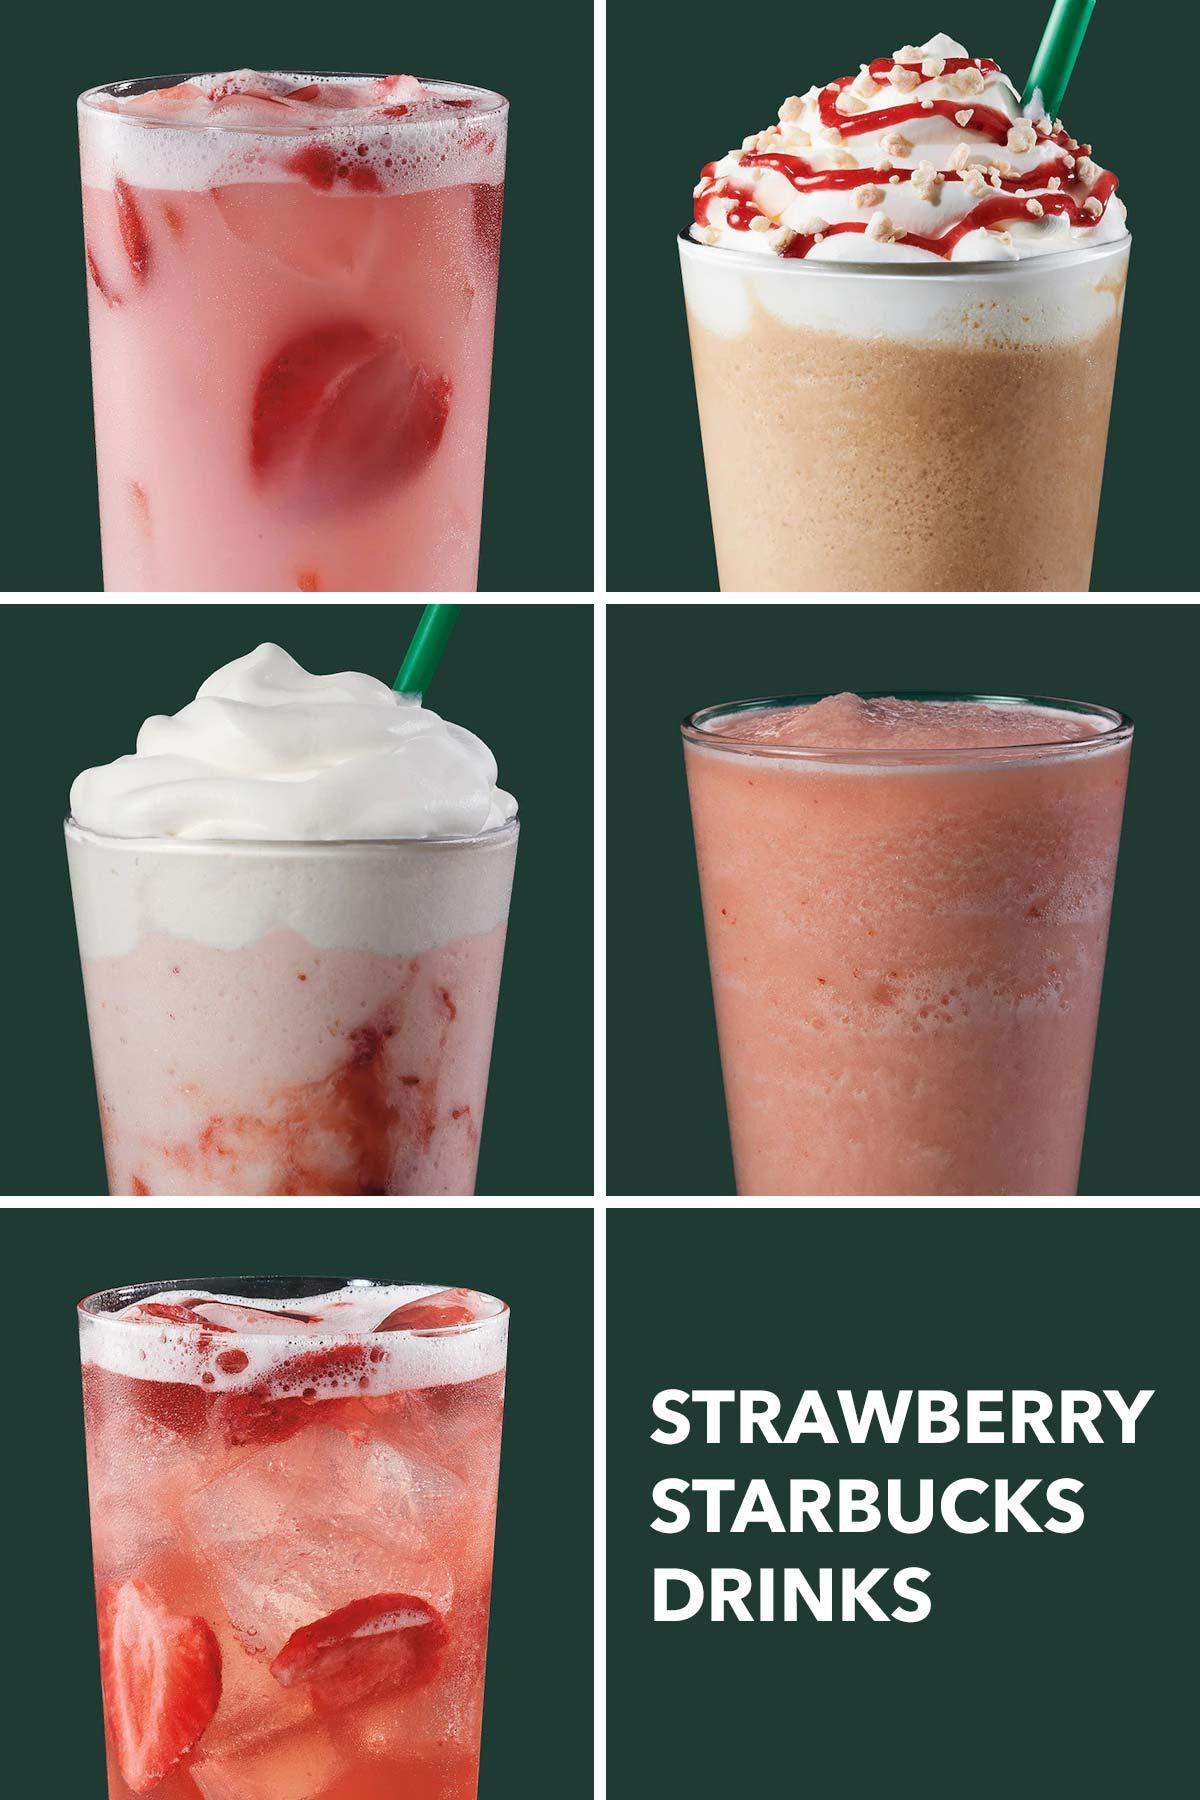 Six photo grid showing five Starbucks strawberry drinks.